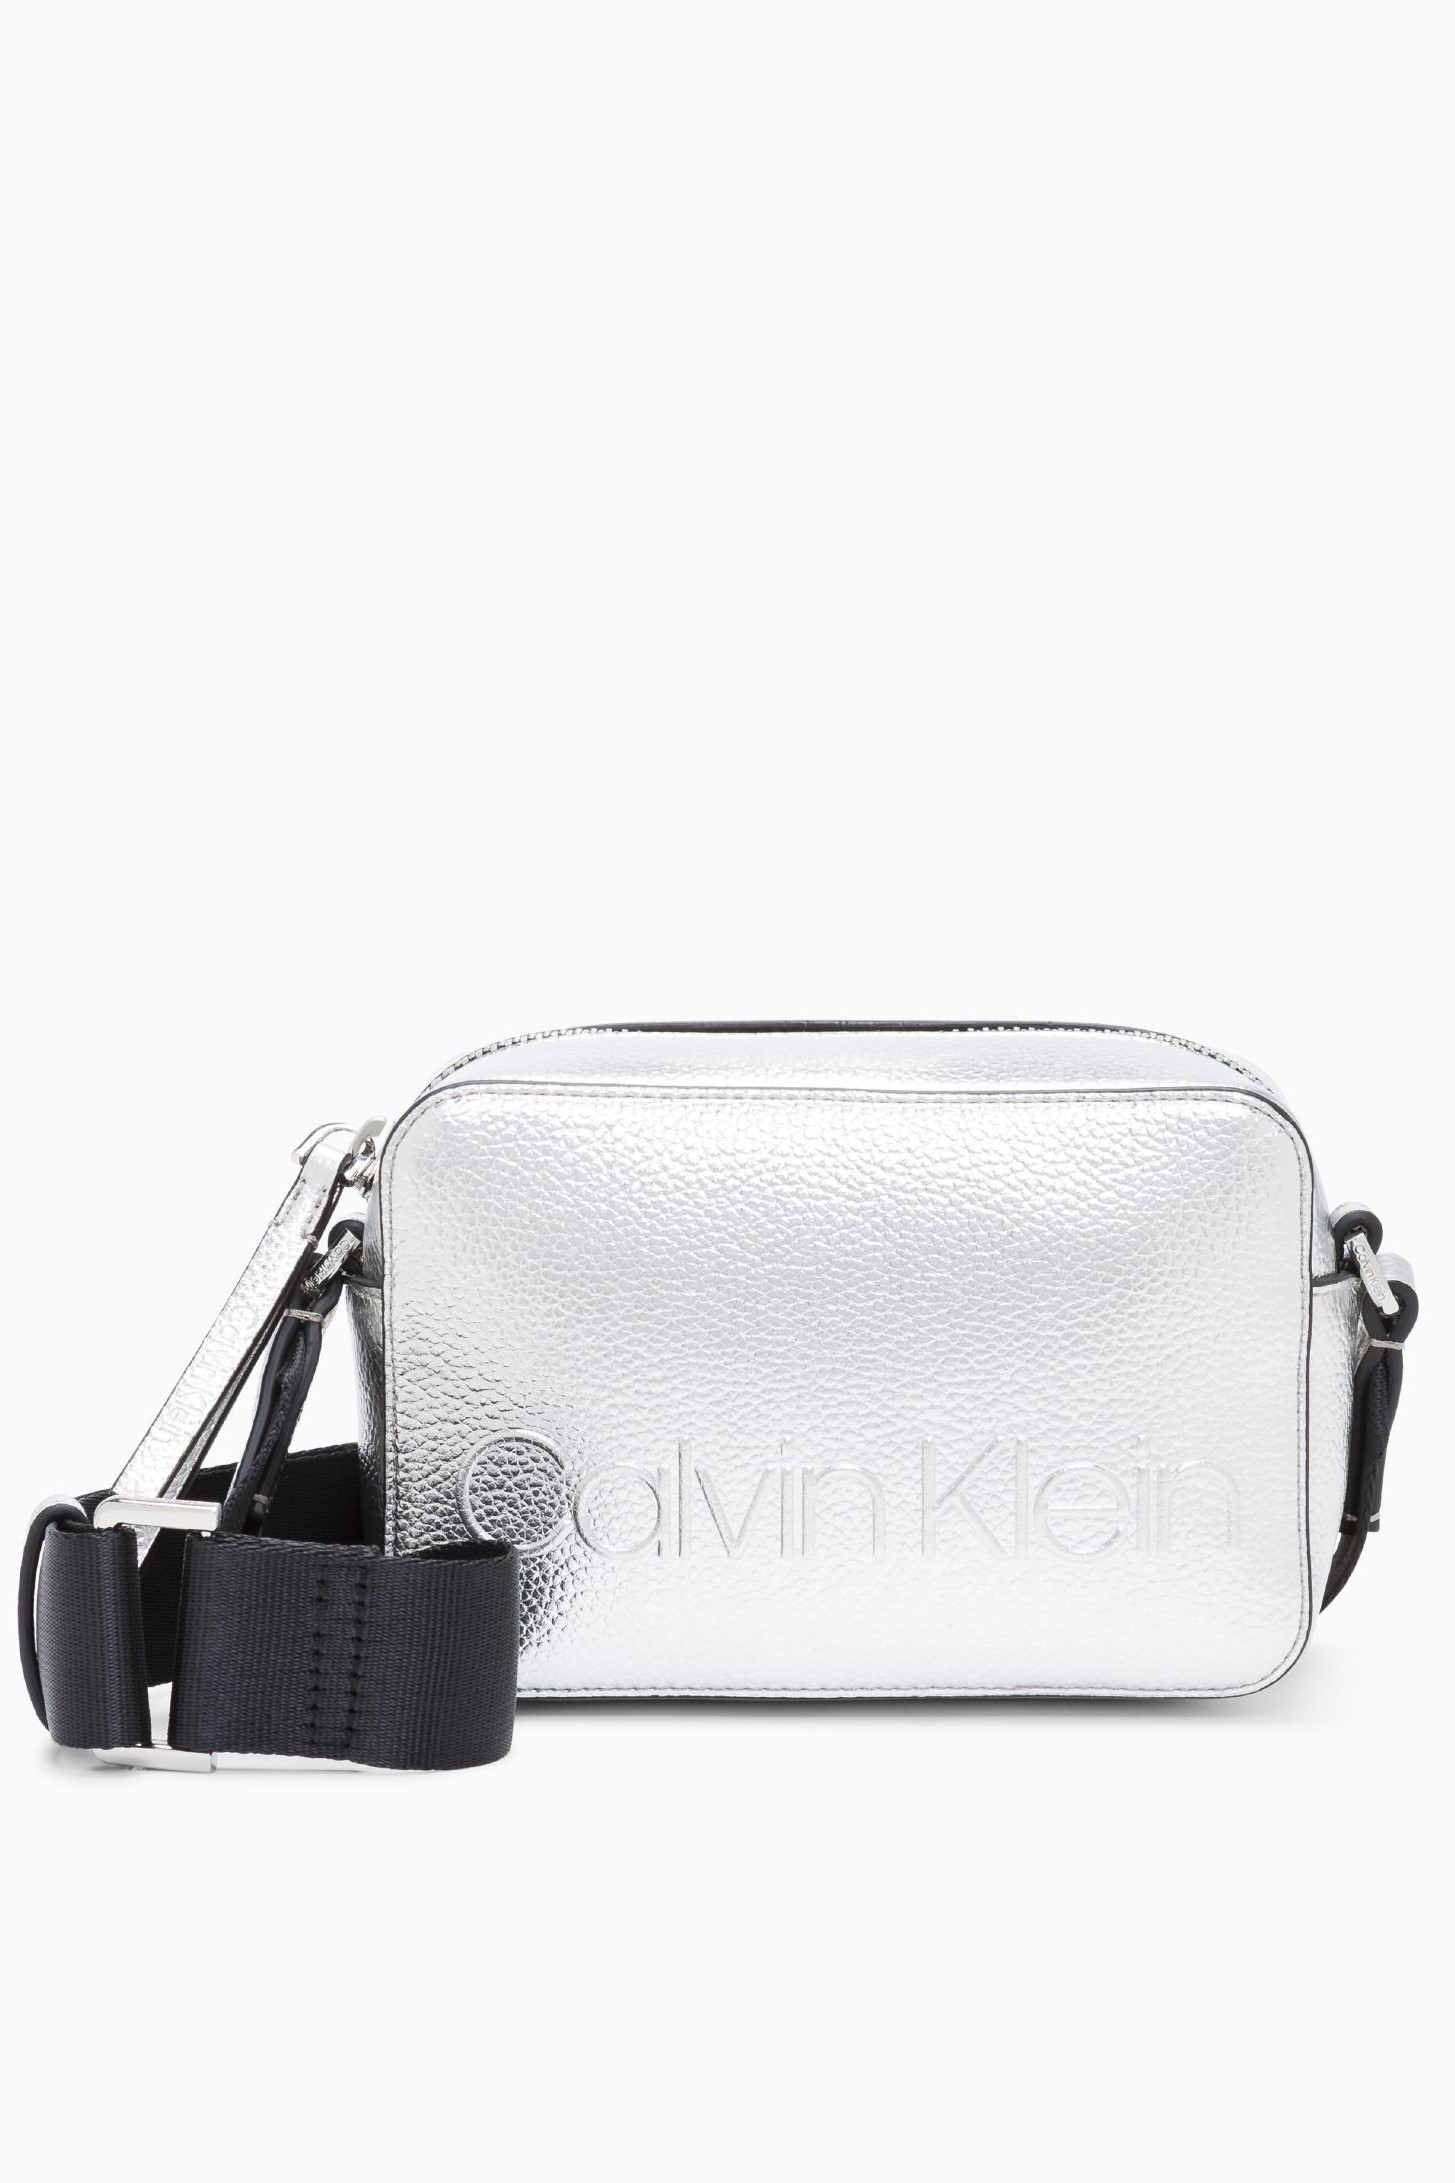 b7facdbdc5 Calvin Klein strieborná malá kabelka Edge Camera Bag Met Silver ...